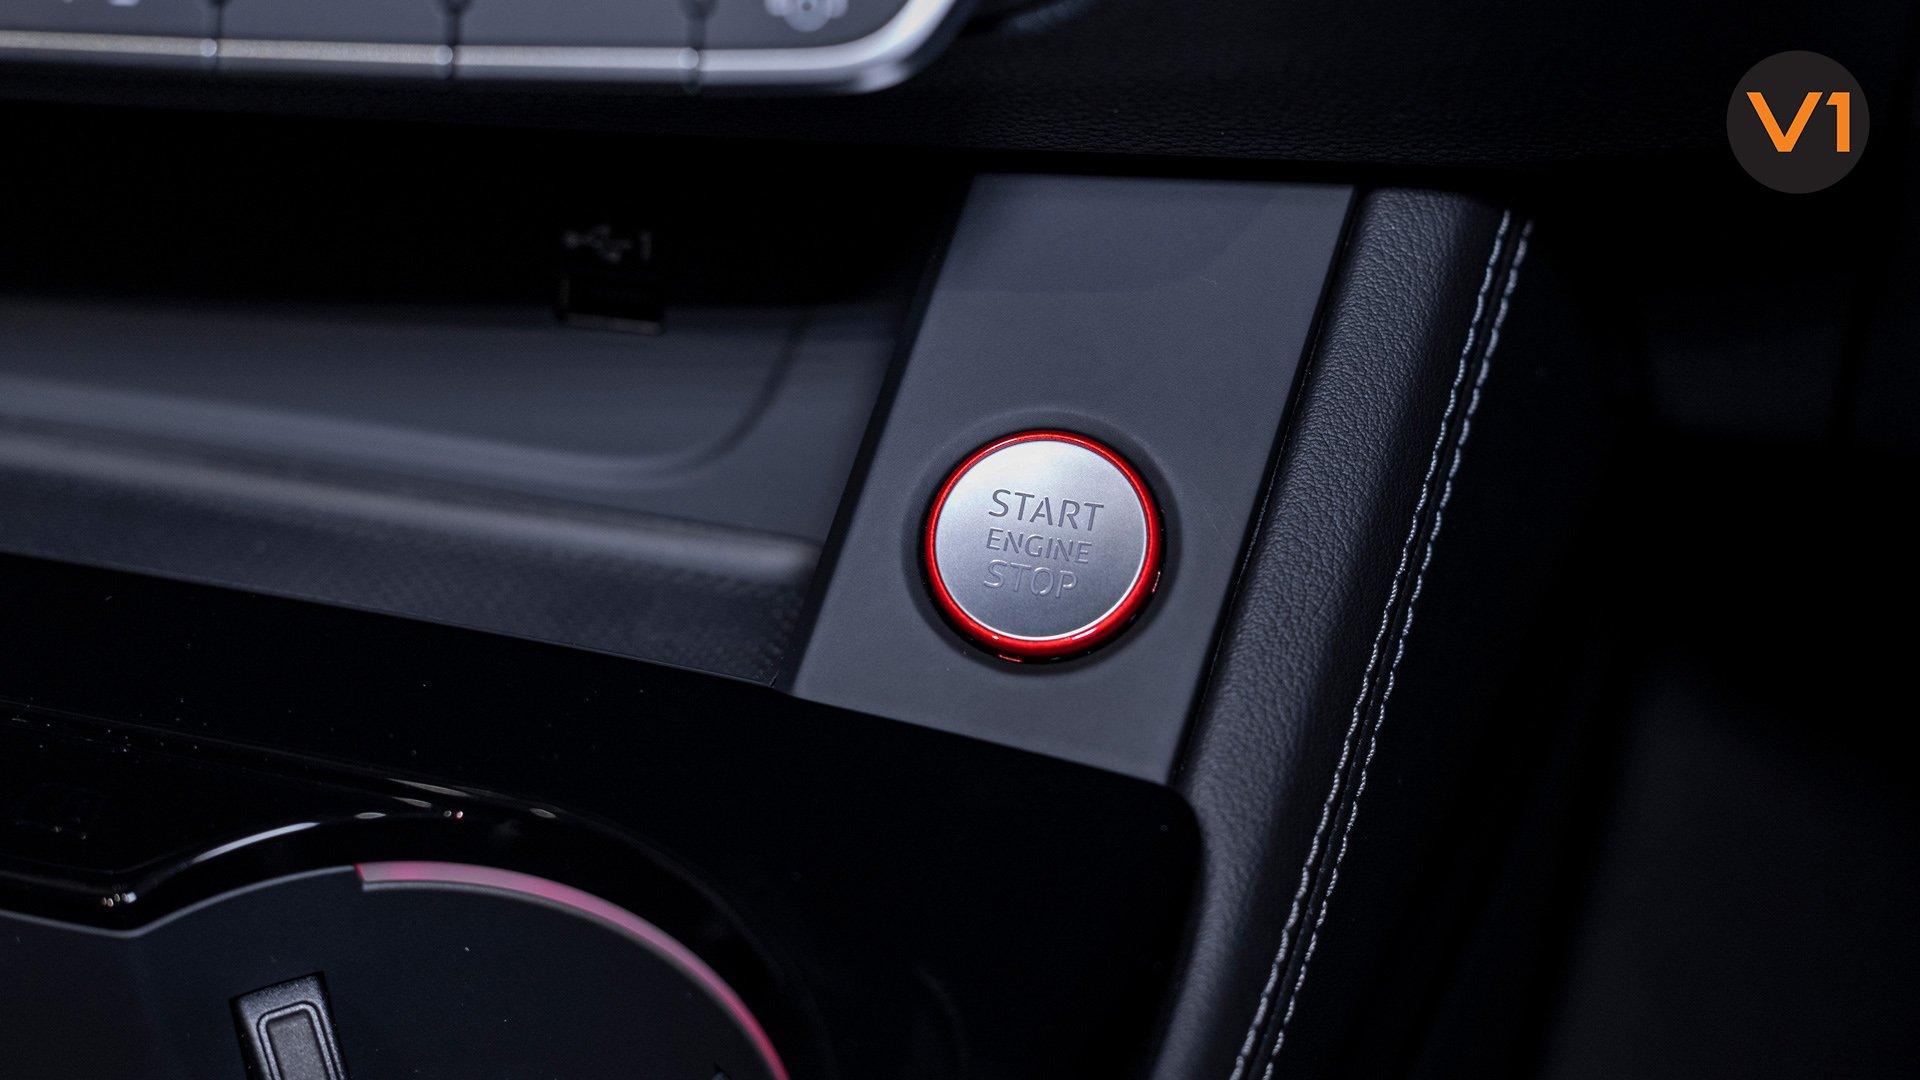 AUDI RS 4 AVANT - Start_Stop Engine